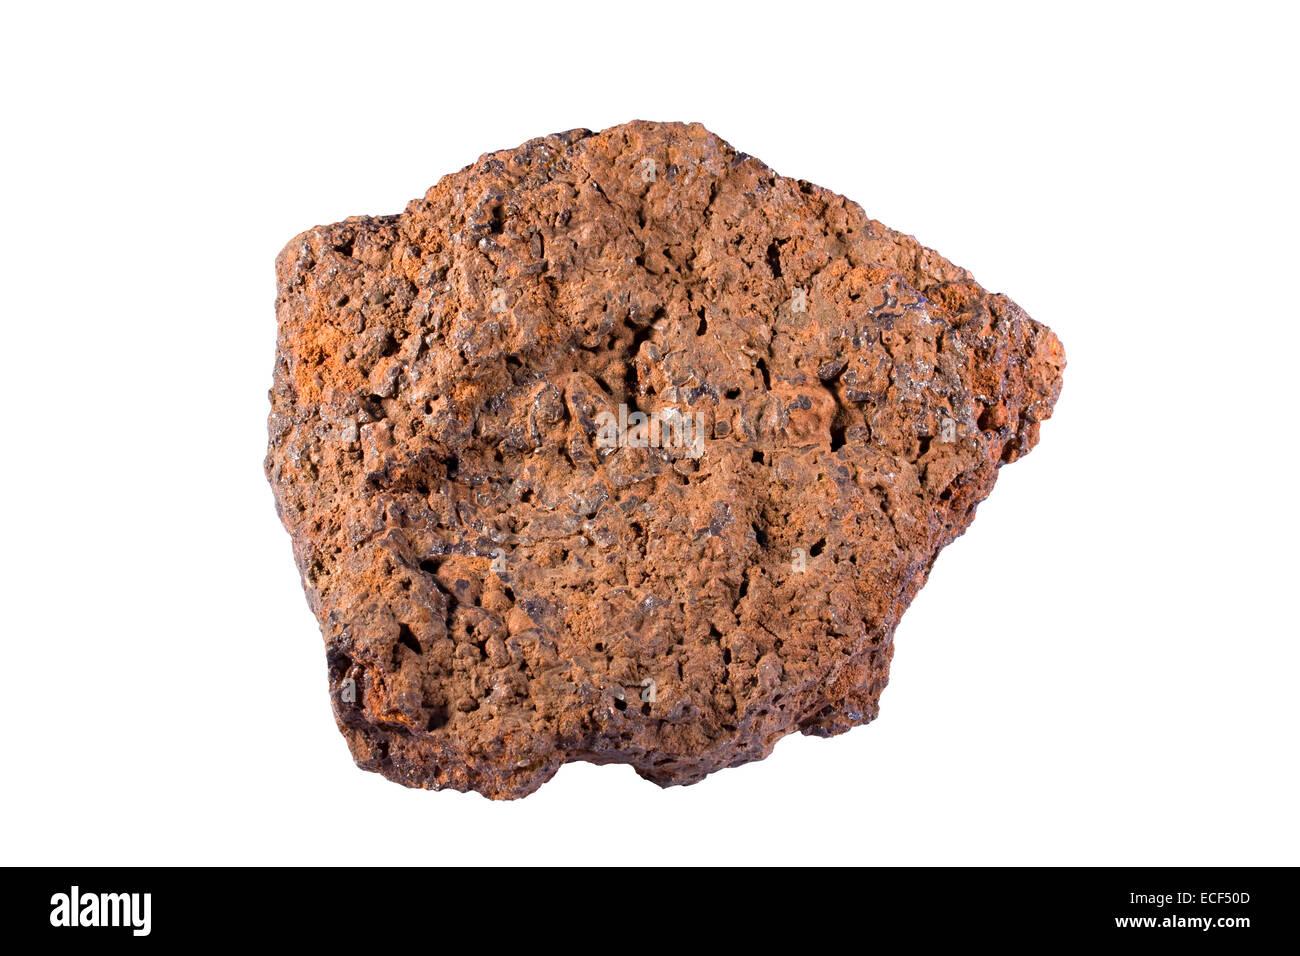 Bog iron (composed of minerals goethite and hematite) - Stock Image